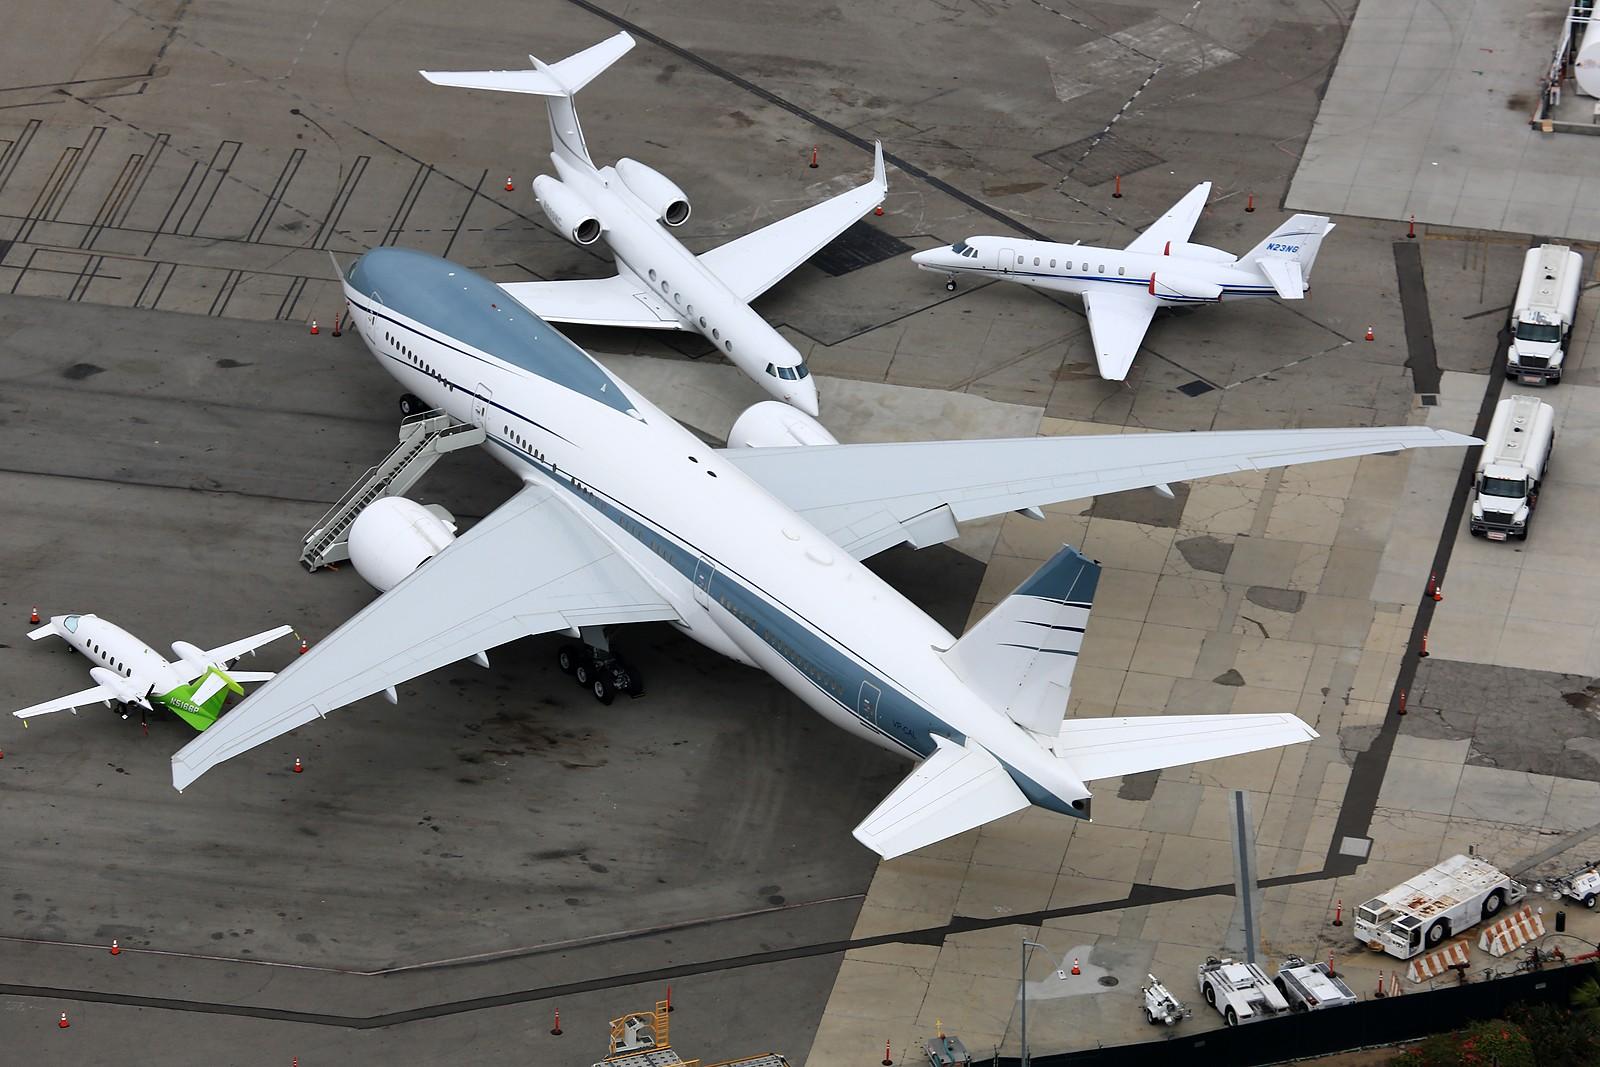 Re:[原创]【LAX】**********777级了,空对空&空对地部分777合集[1600*1067]********** BOEING 777-200LR VP-CAL 美国洛杉矶机场